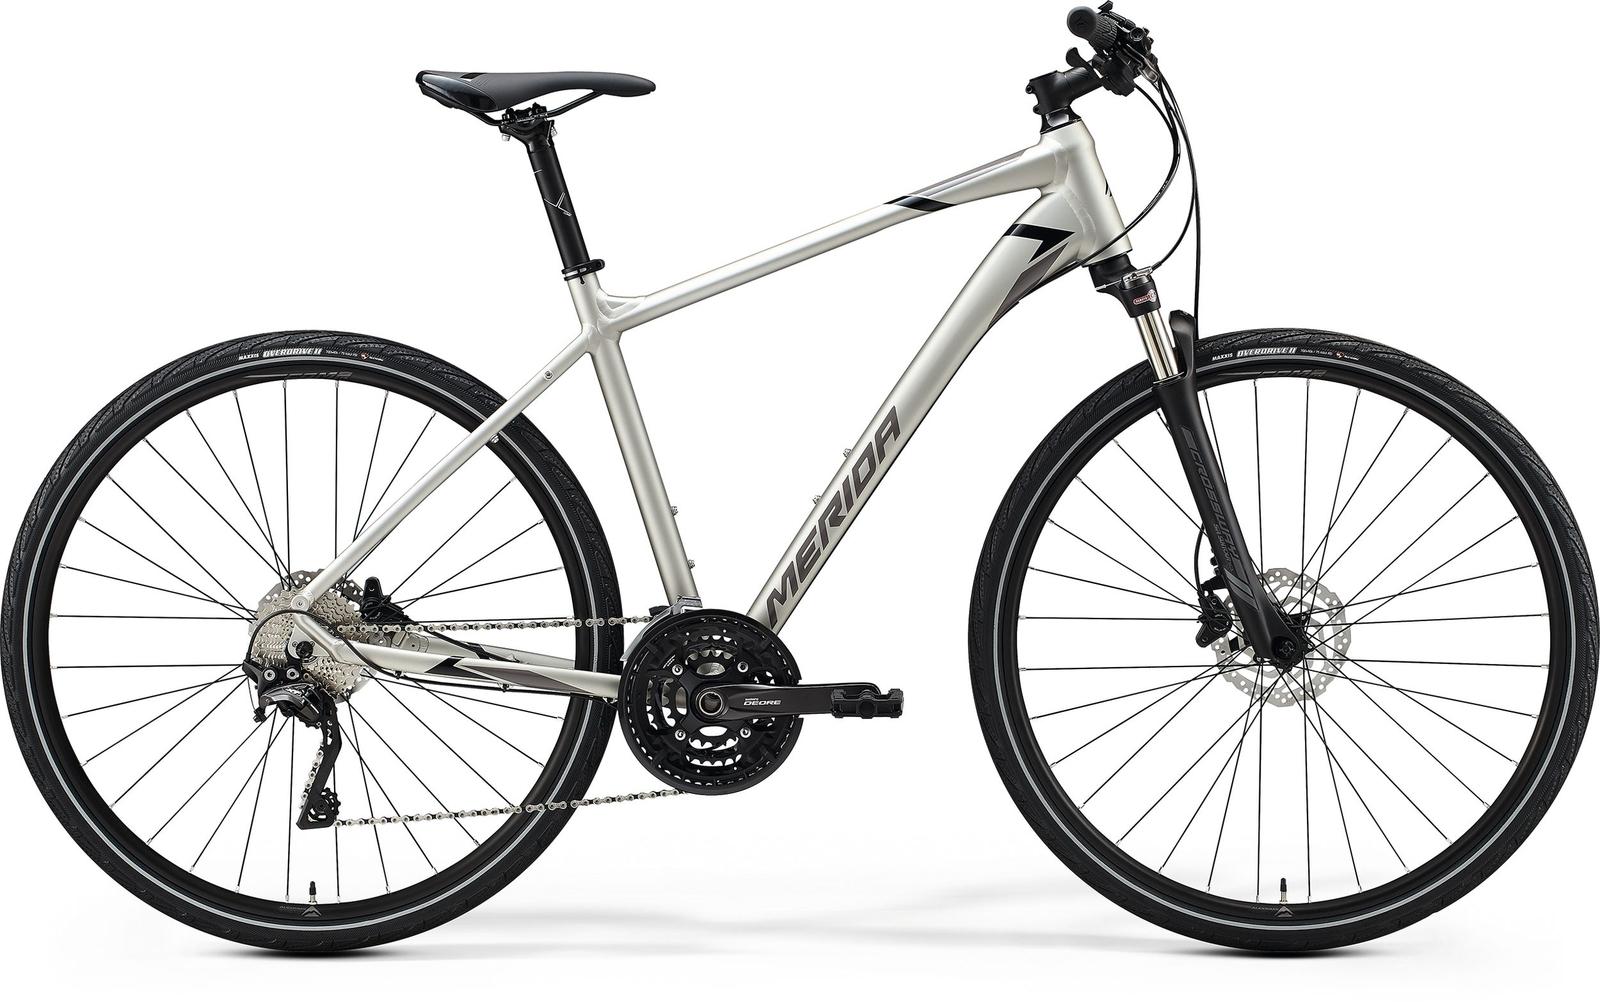 Bicicleta de trekking/oras barbati Merida Crossway 600 Titan/Negru 2020 imagine